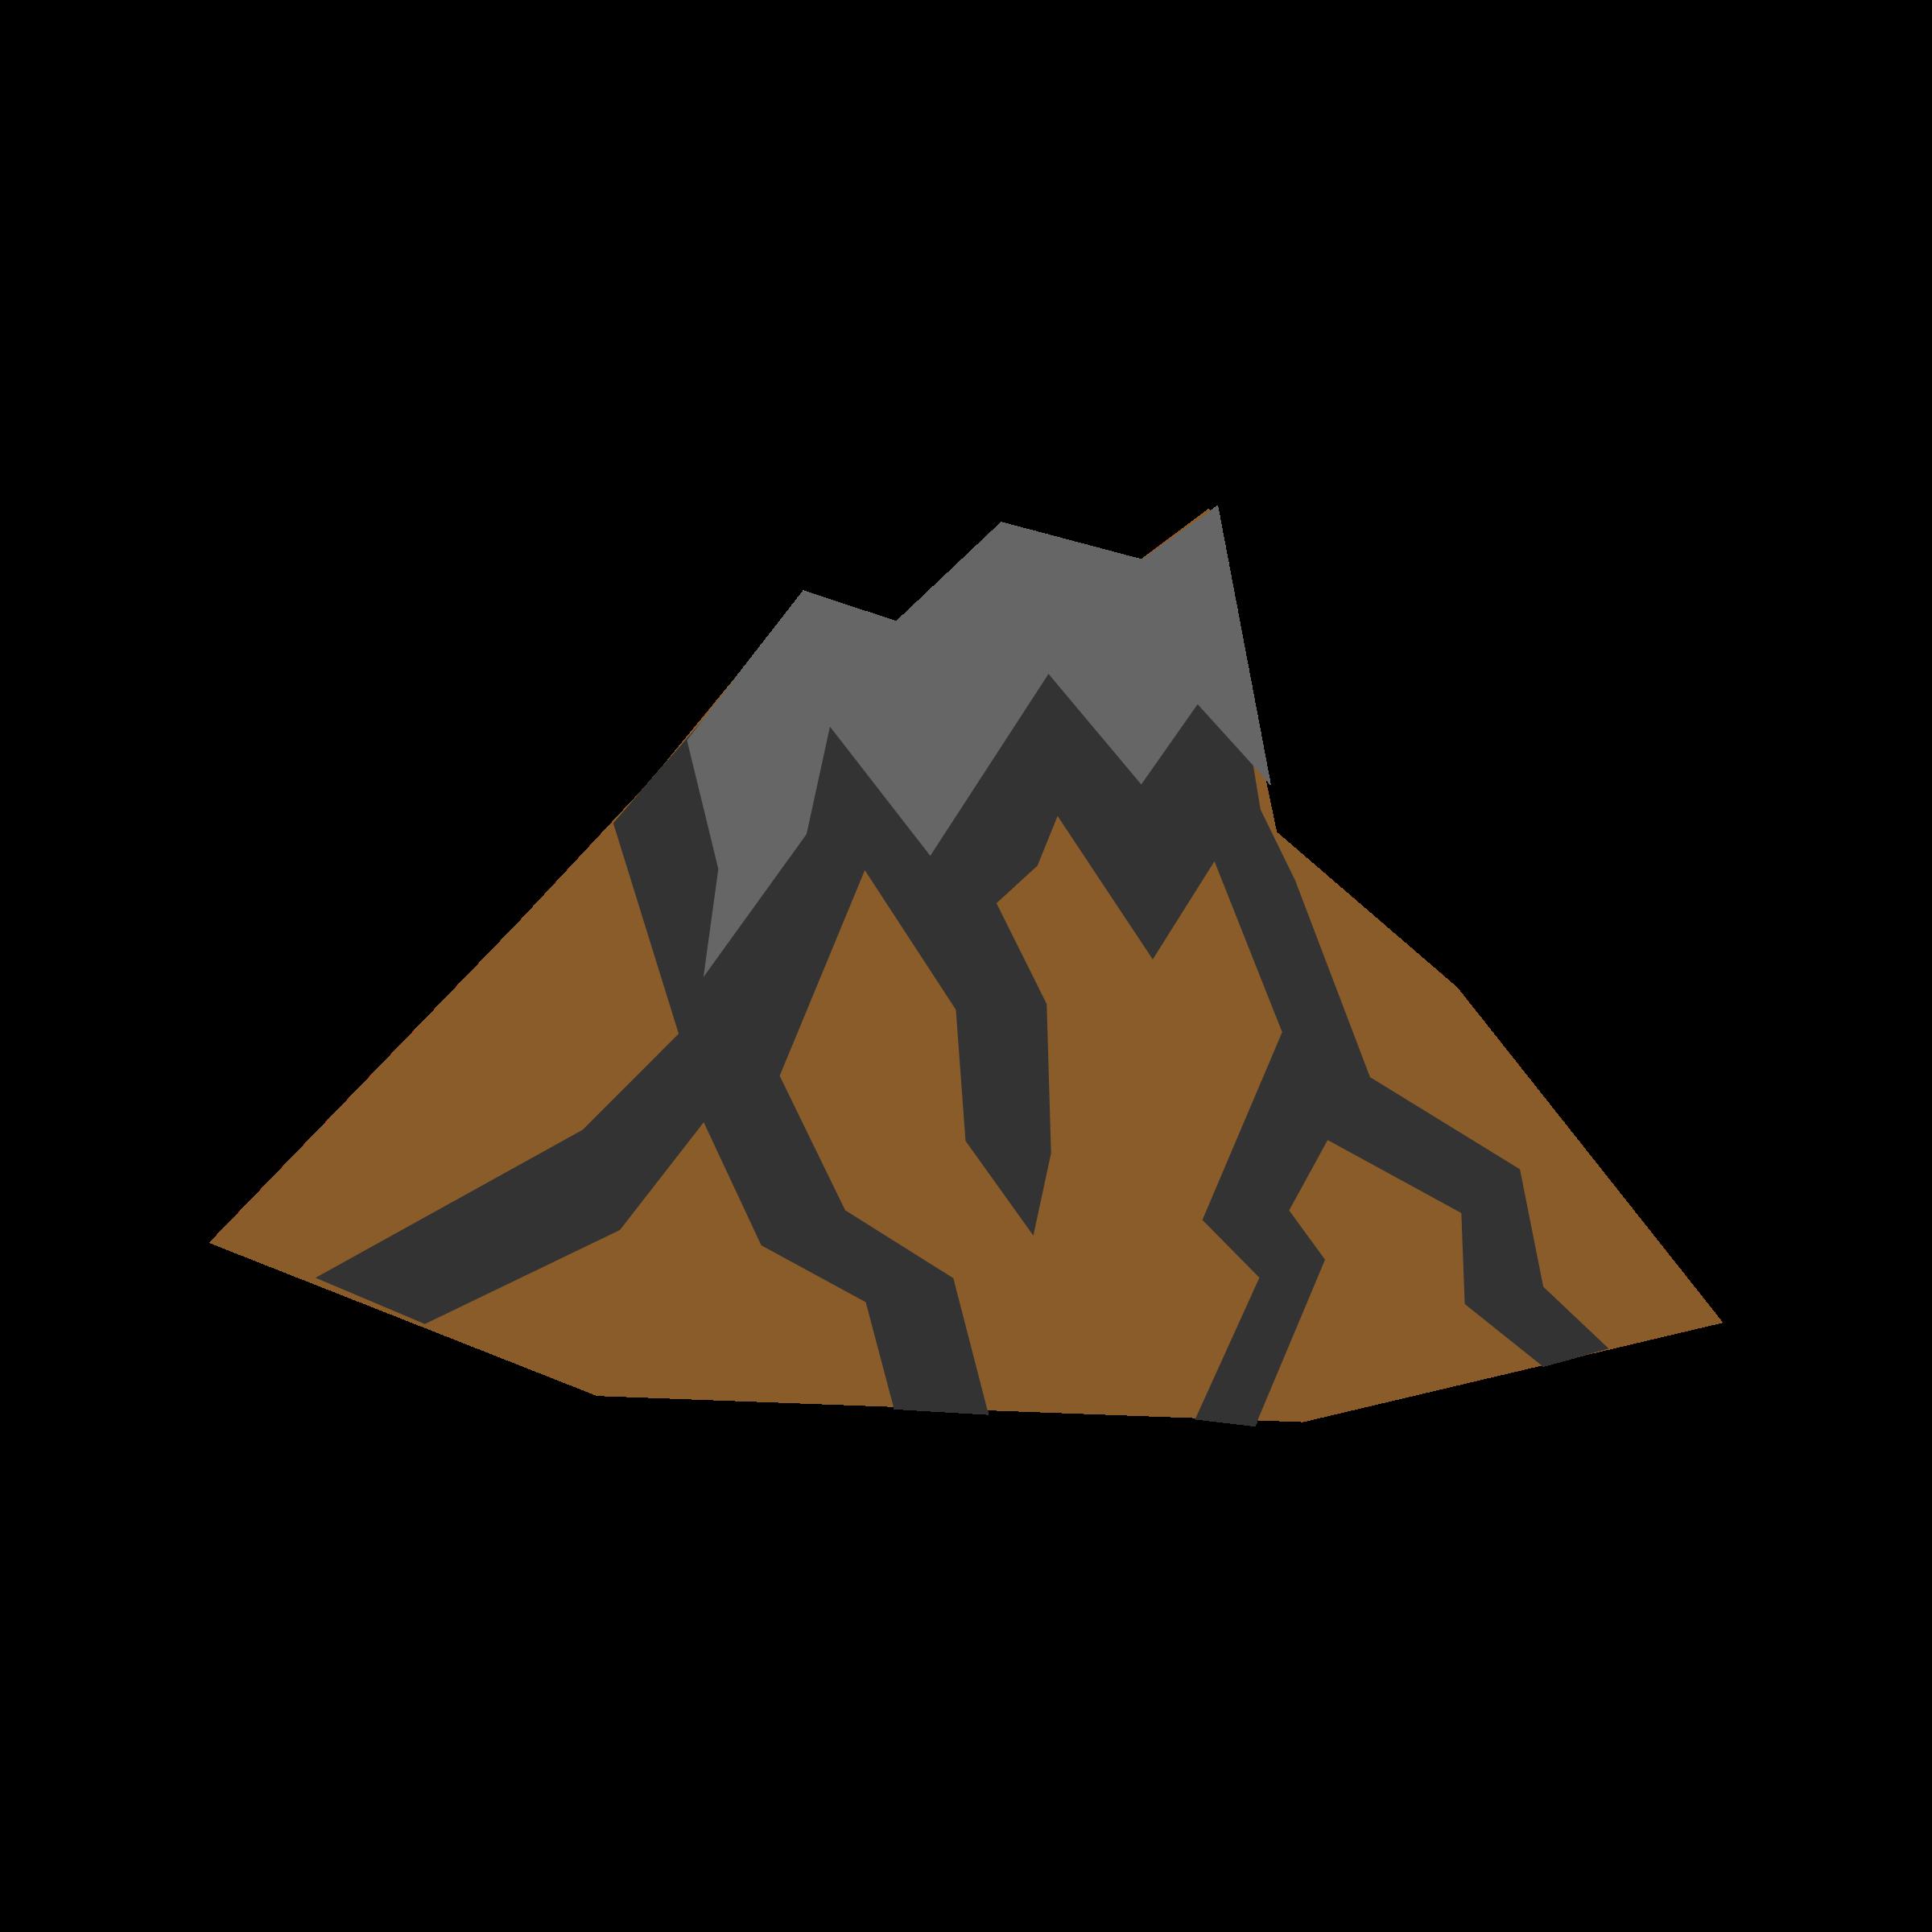 Dormant volcano clipart.